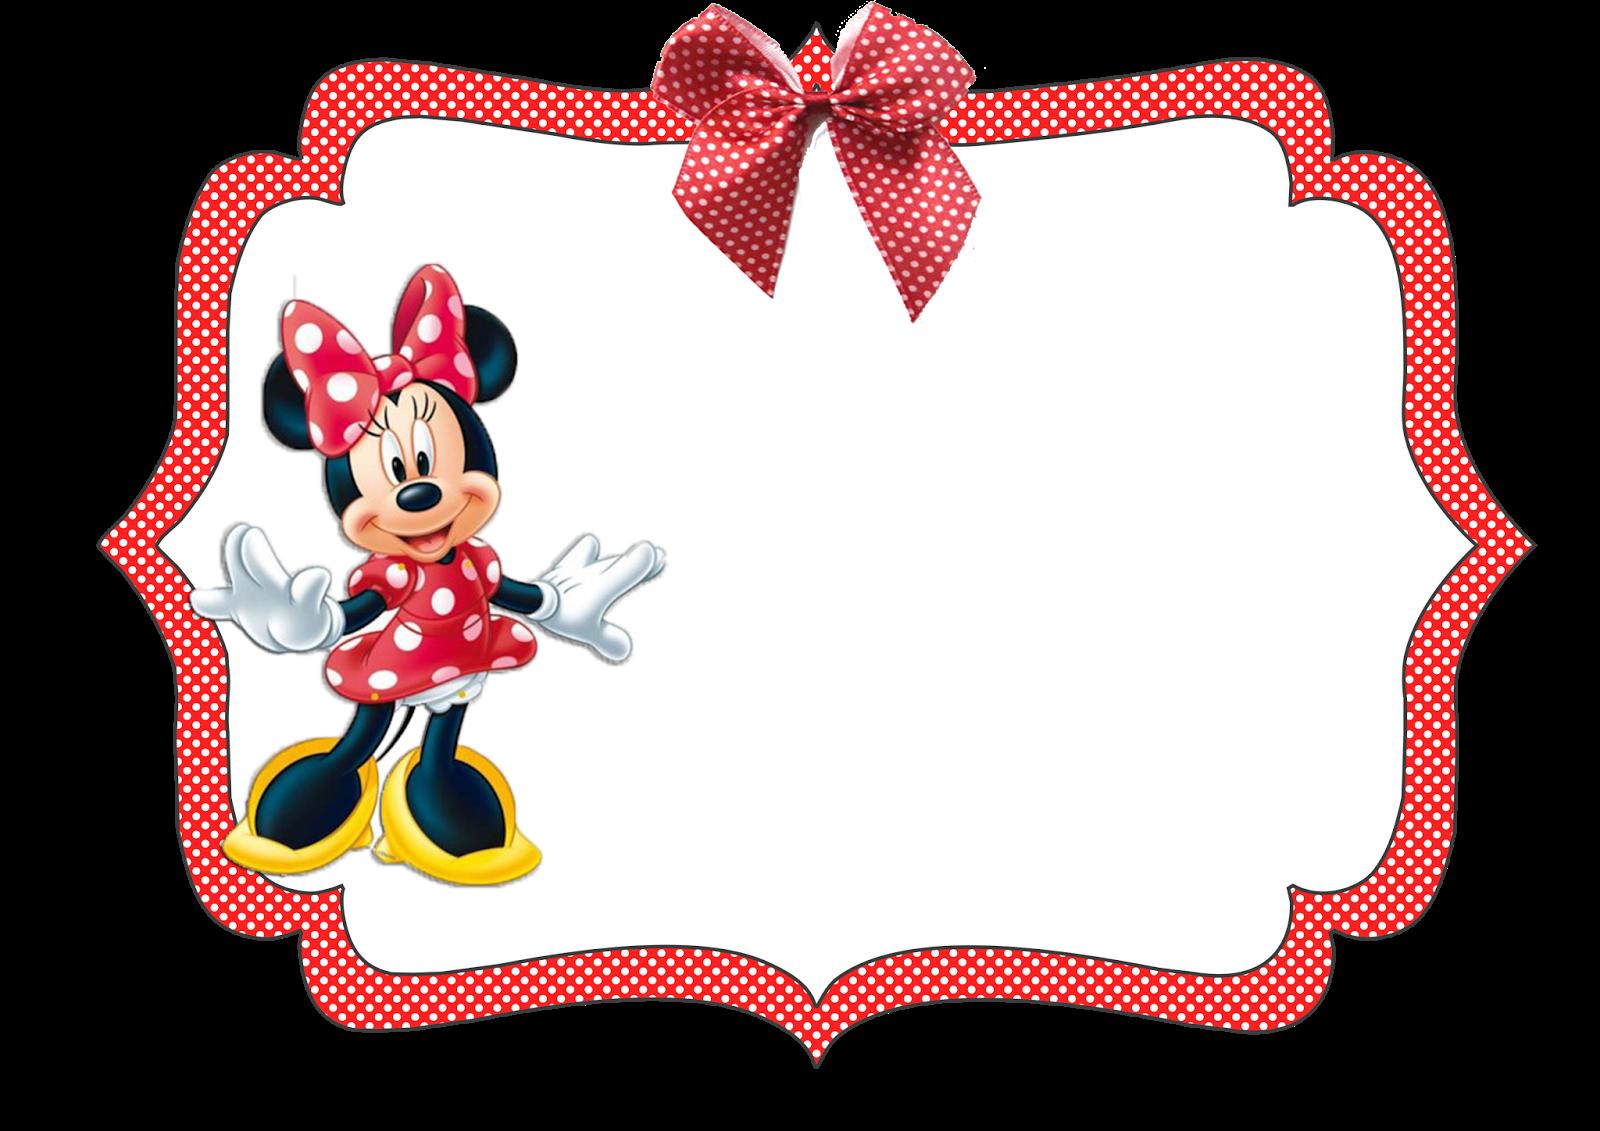 Kit Aniversário Personalizados Tema Minnie Vermelha Para Imprimir